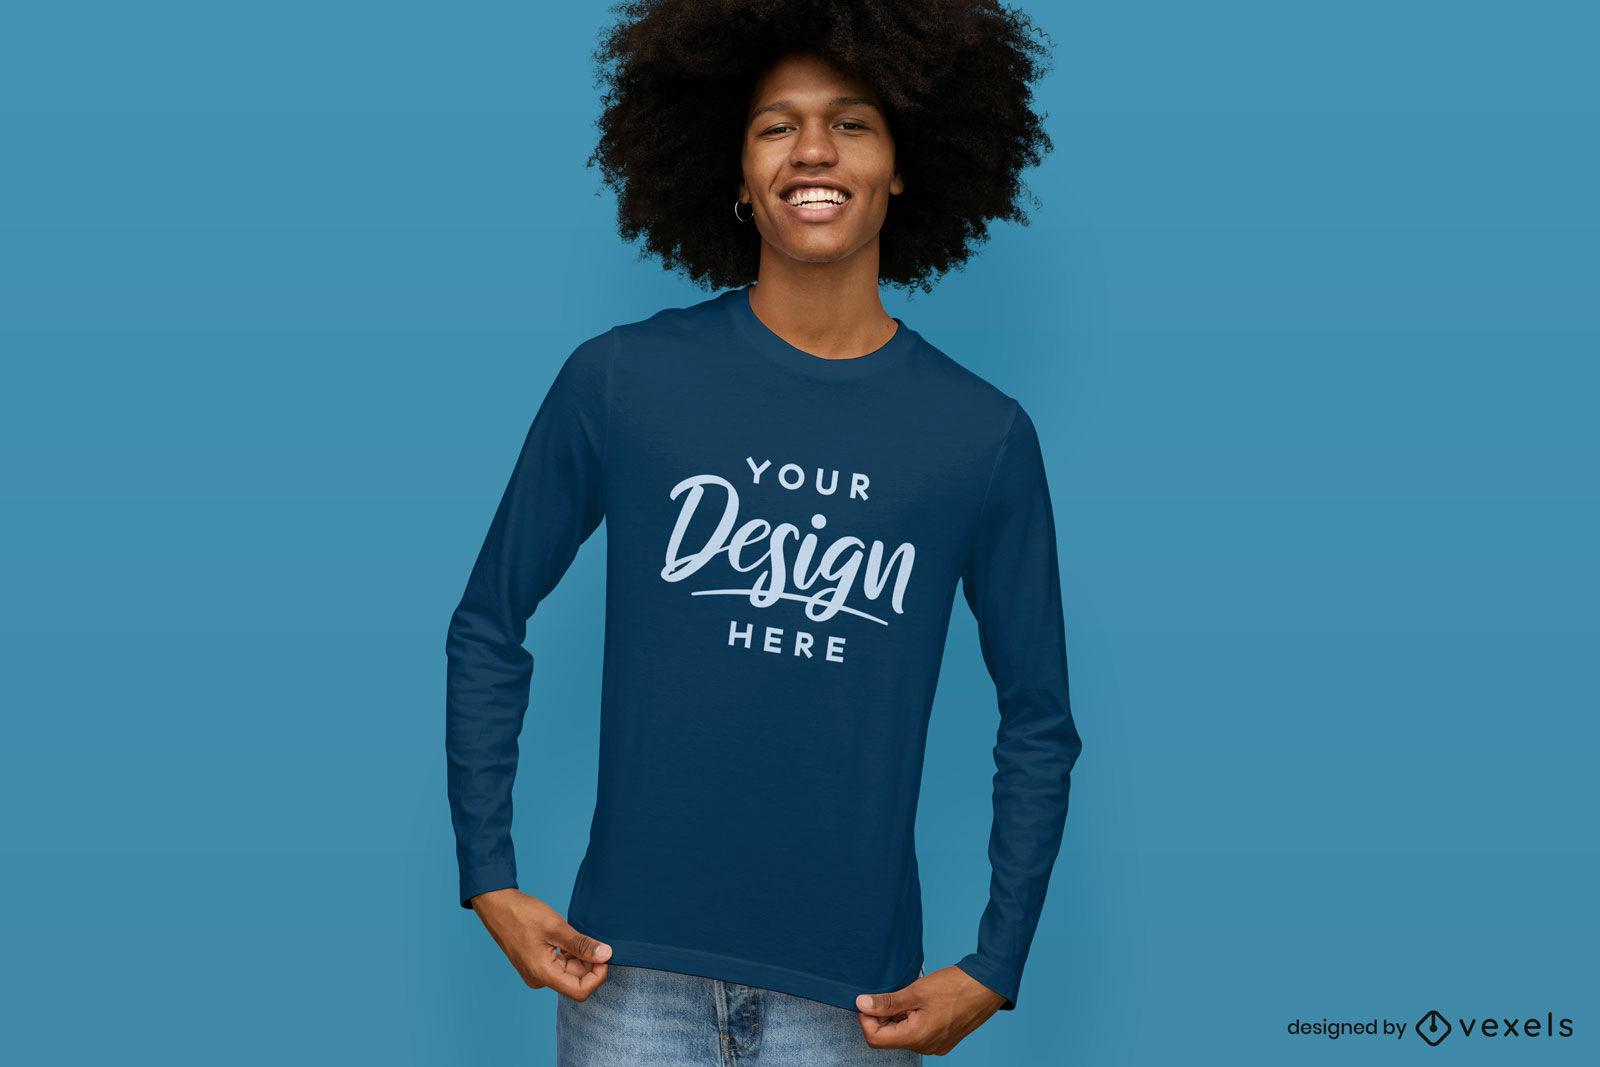 Maqueta de camiseta de manga larga azul fondo azul